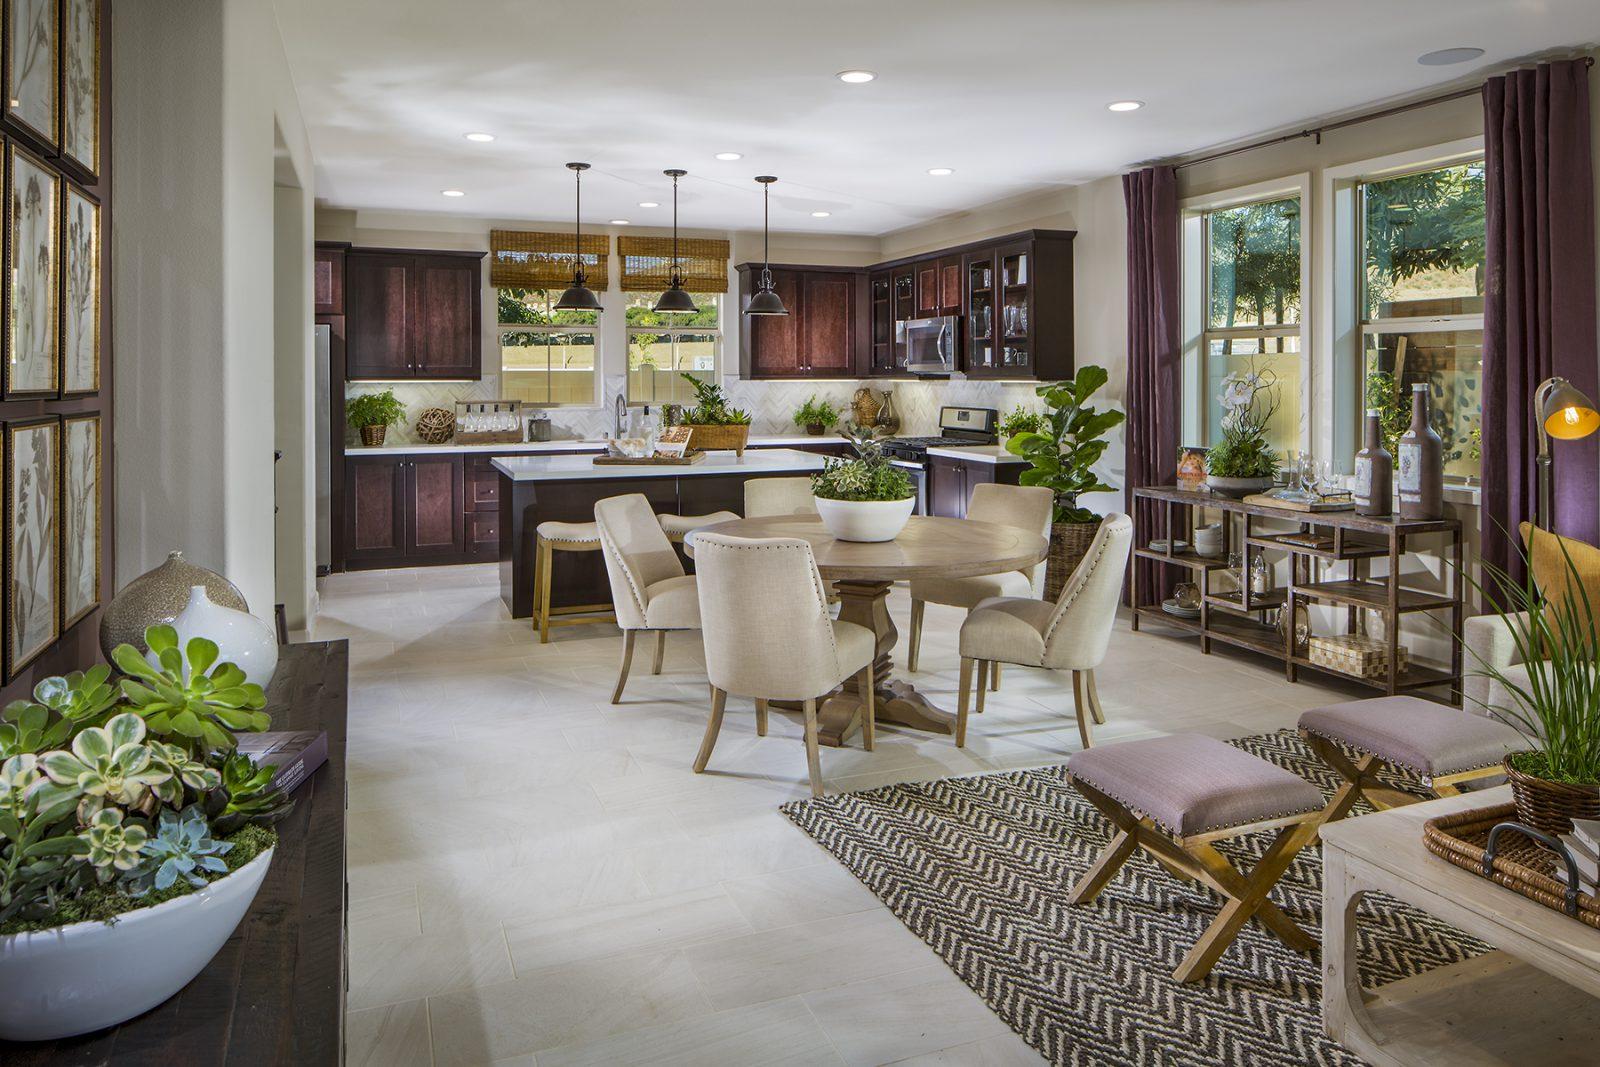 Residence 2 Kitchen | Terracina At Rancho Tesoro In San Marcos, CA |  Brookfield Residential